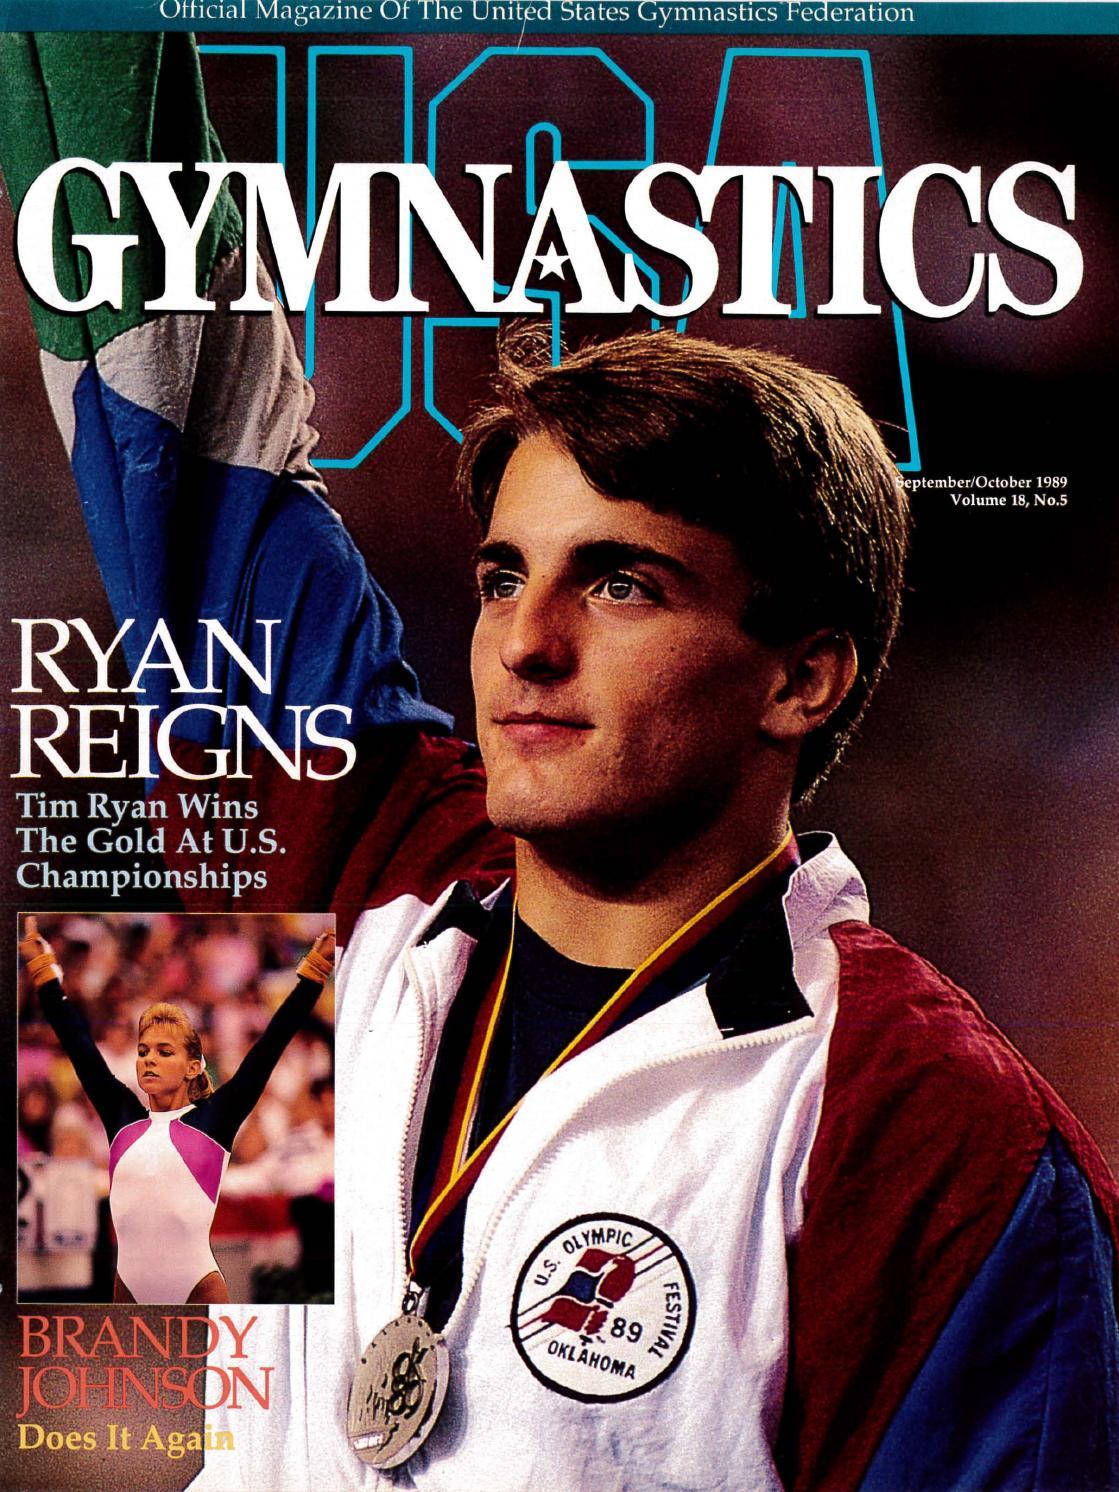 USA Gymnastics September October 1989 By USA Gymnastics Issuu